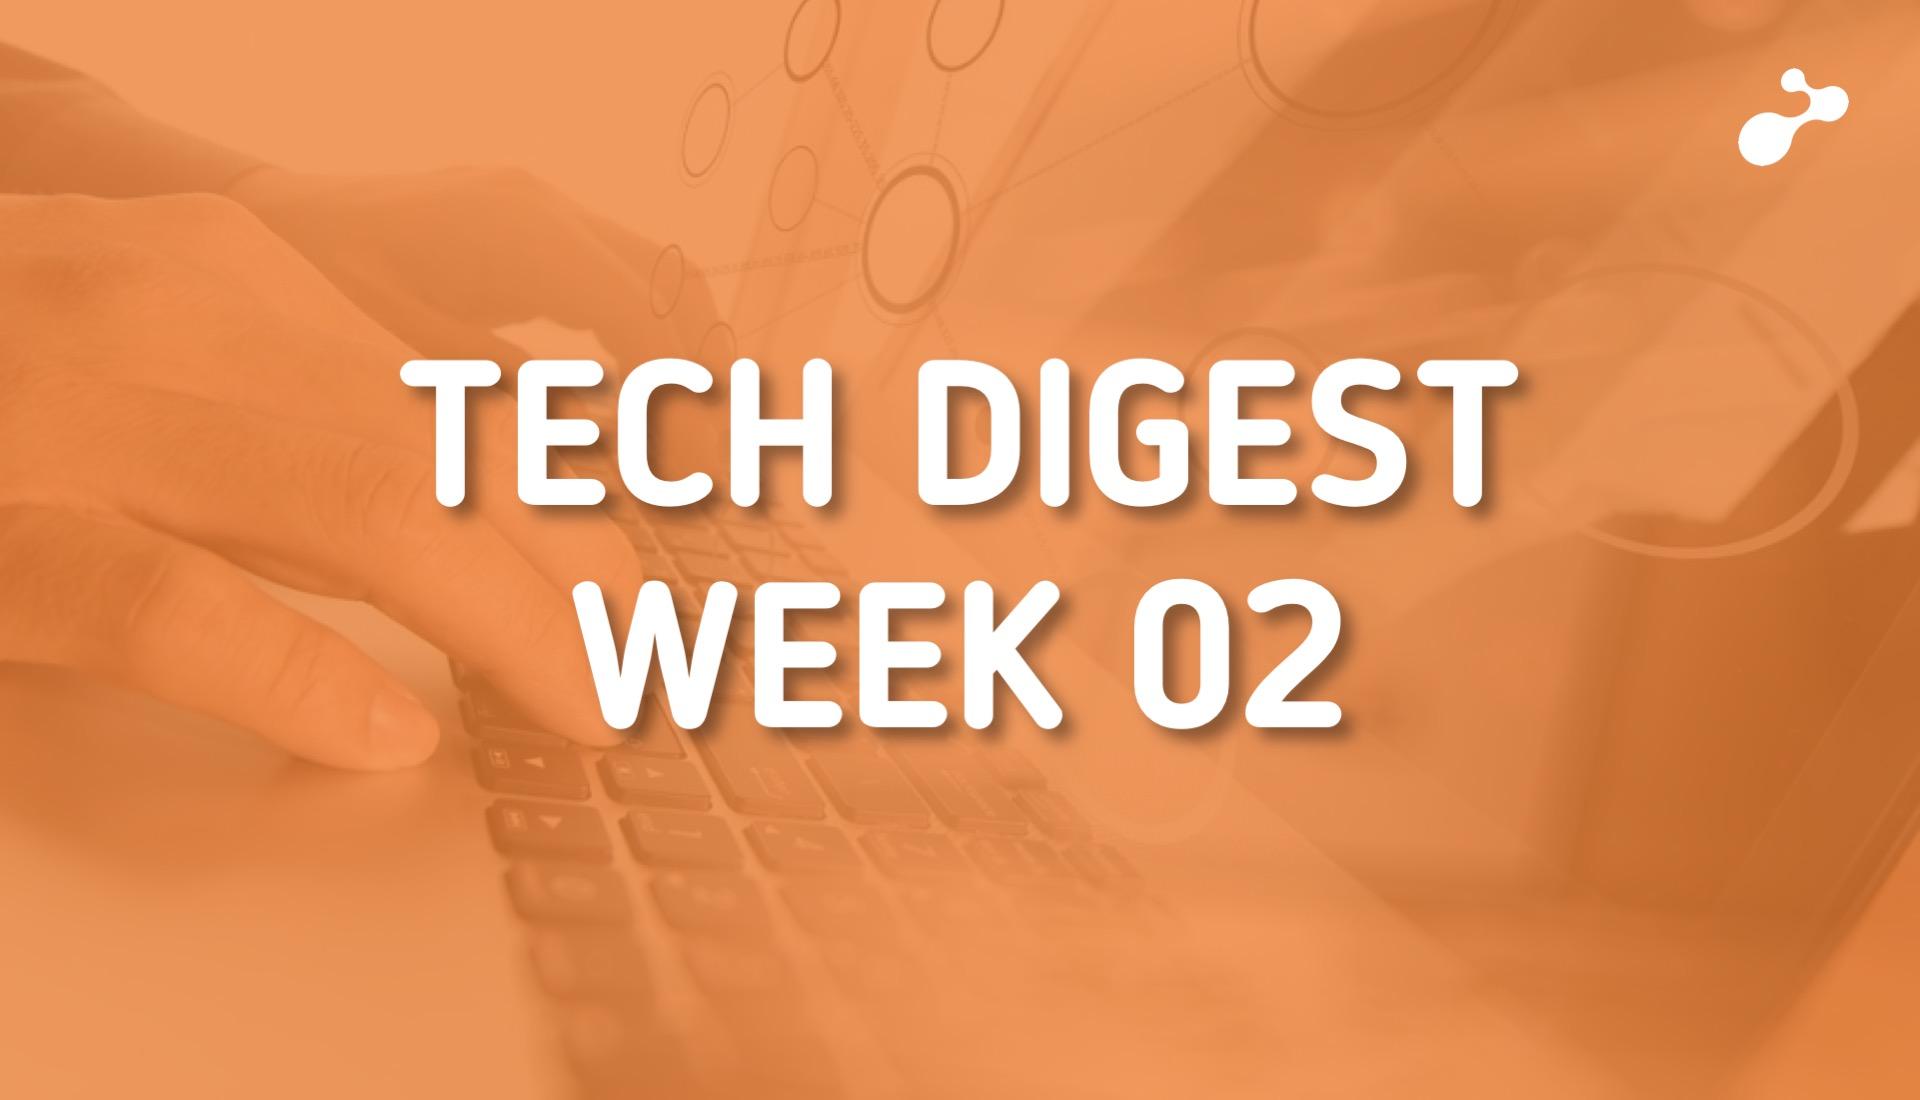 Technology news around the world - Week 02, 2019